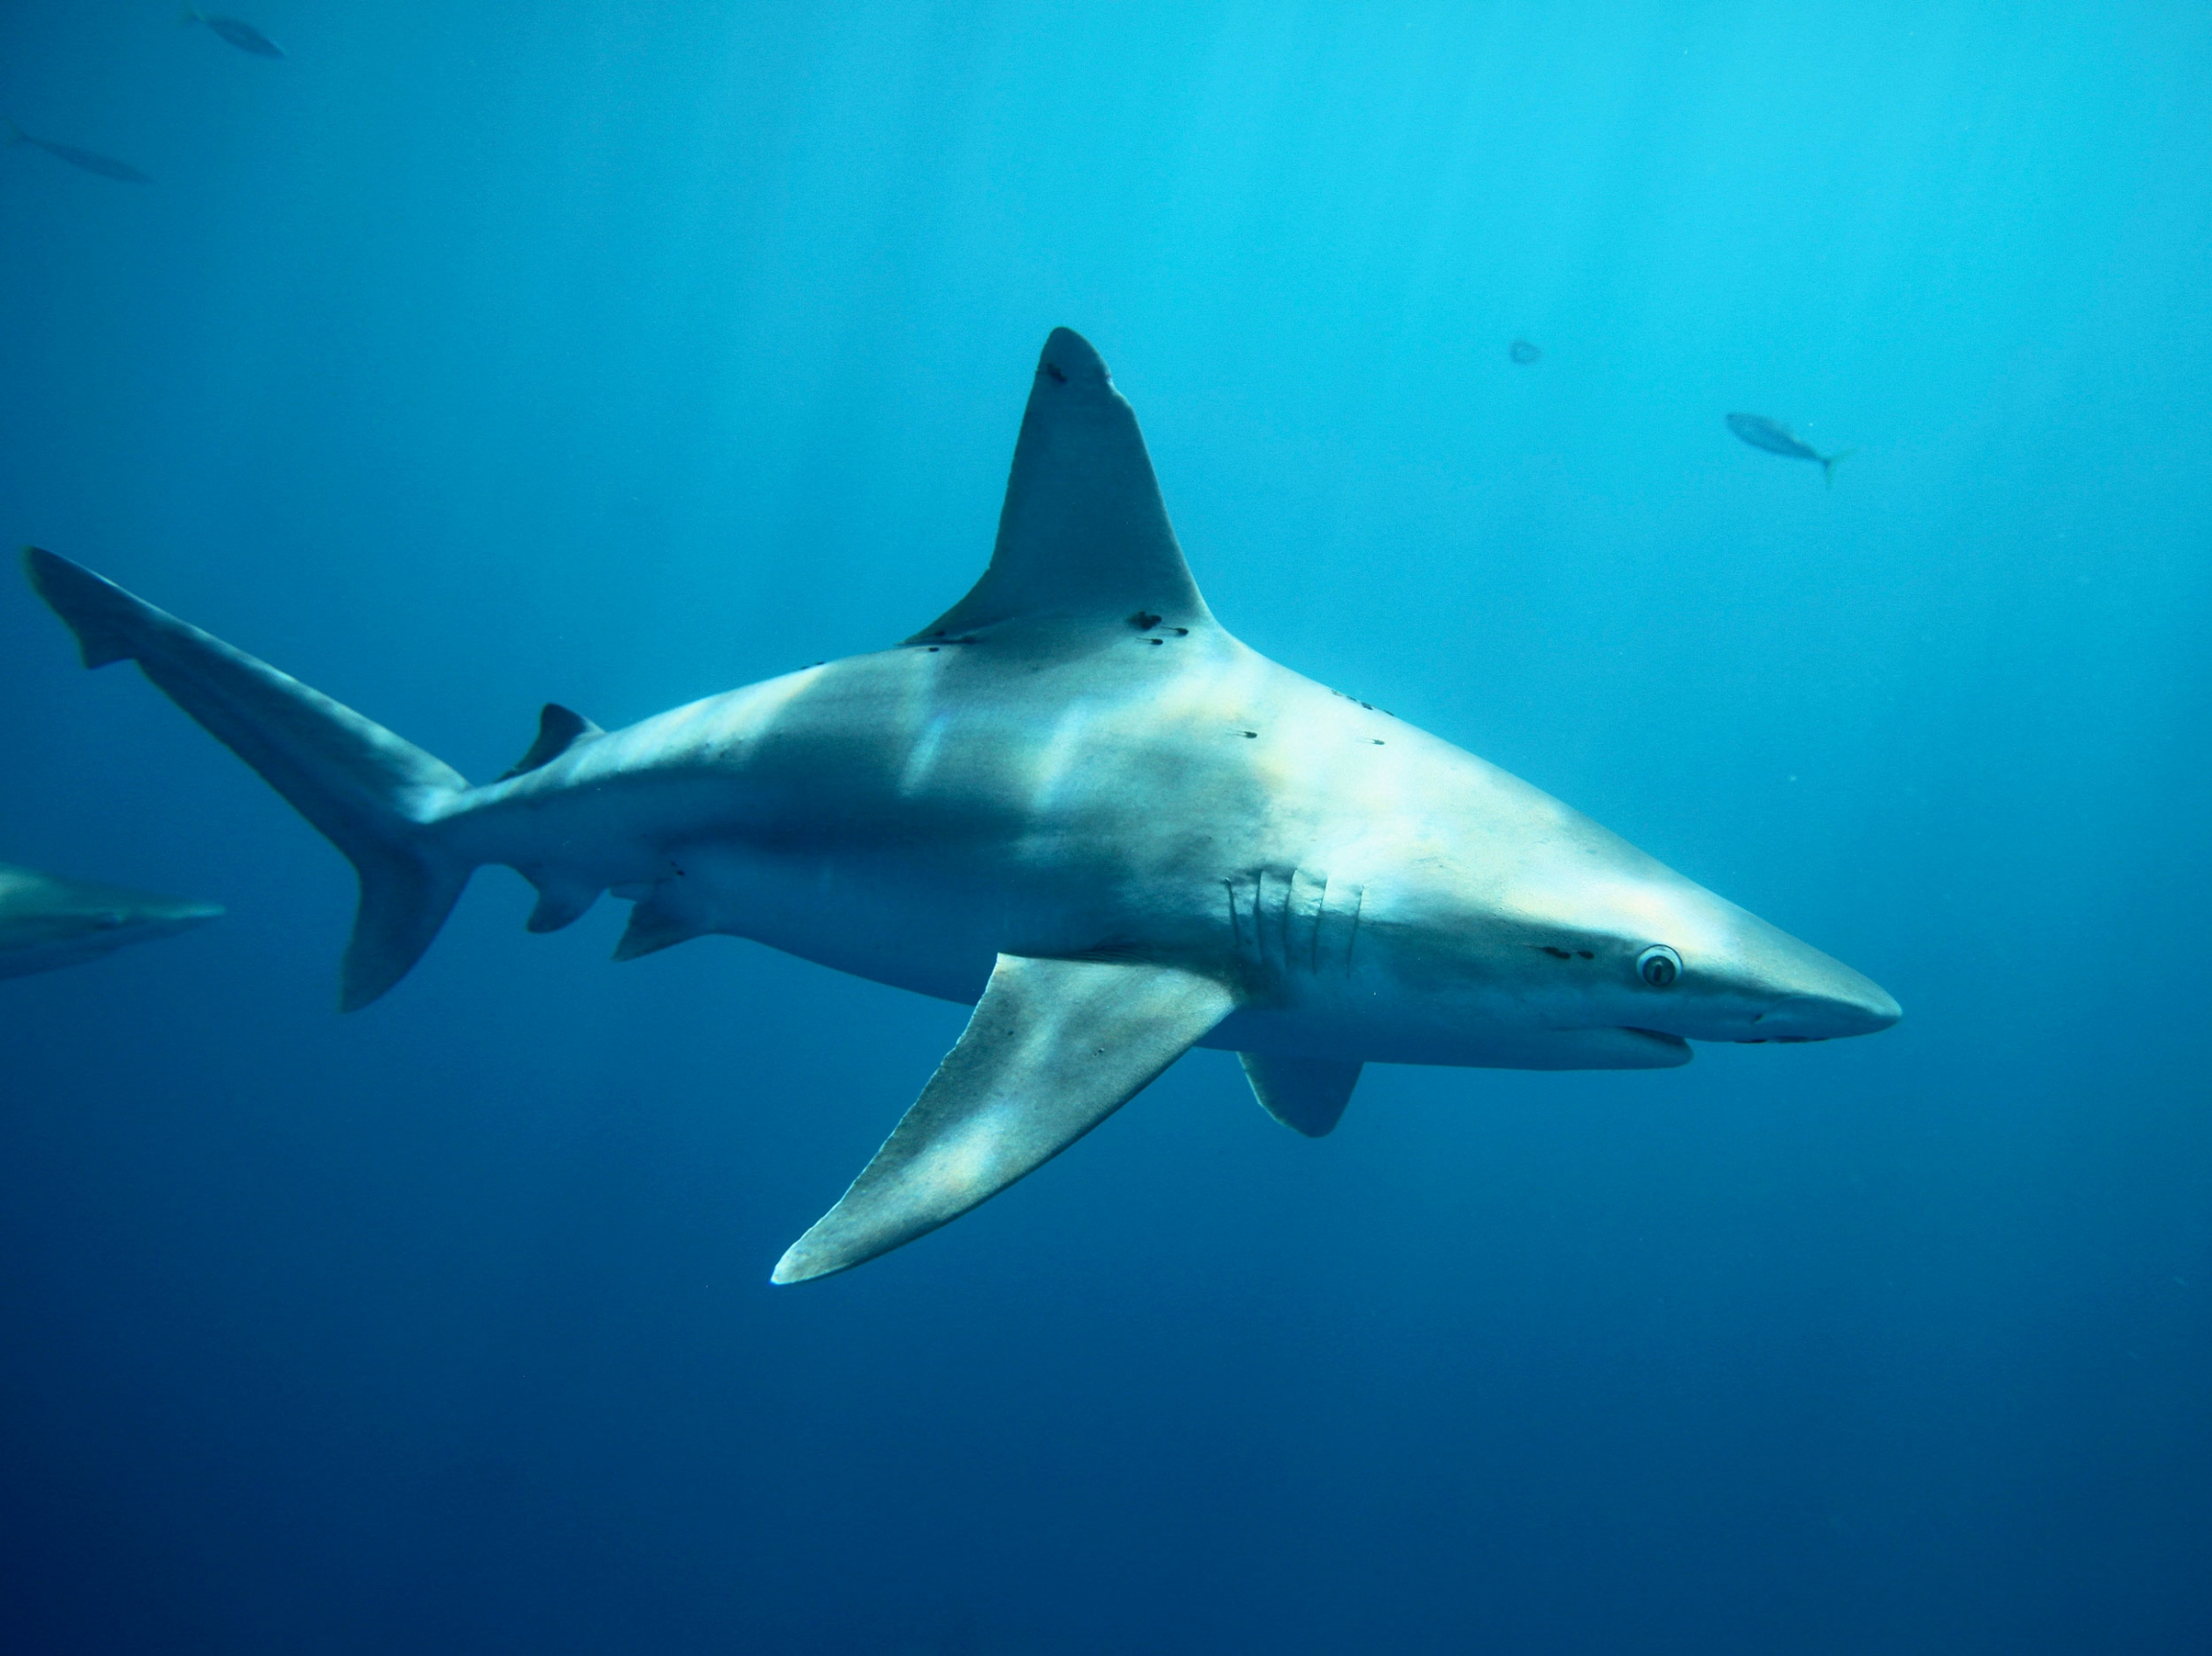 Sandbar sharks swim around during a cageless shark dive tour in Haleiwa, Hawaii.